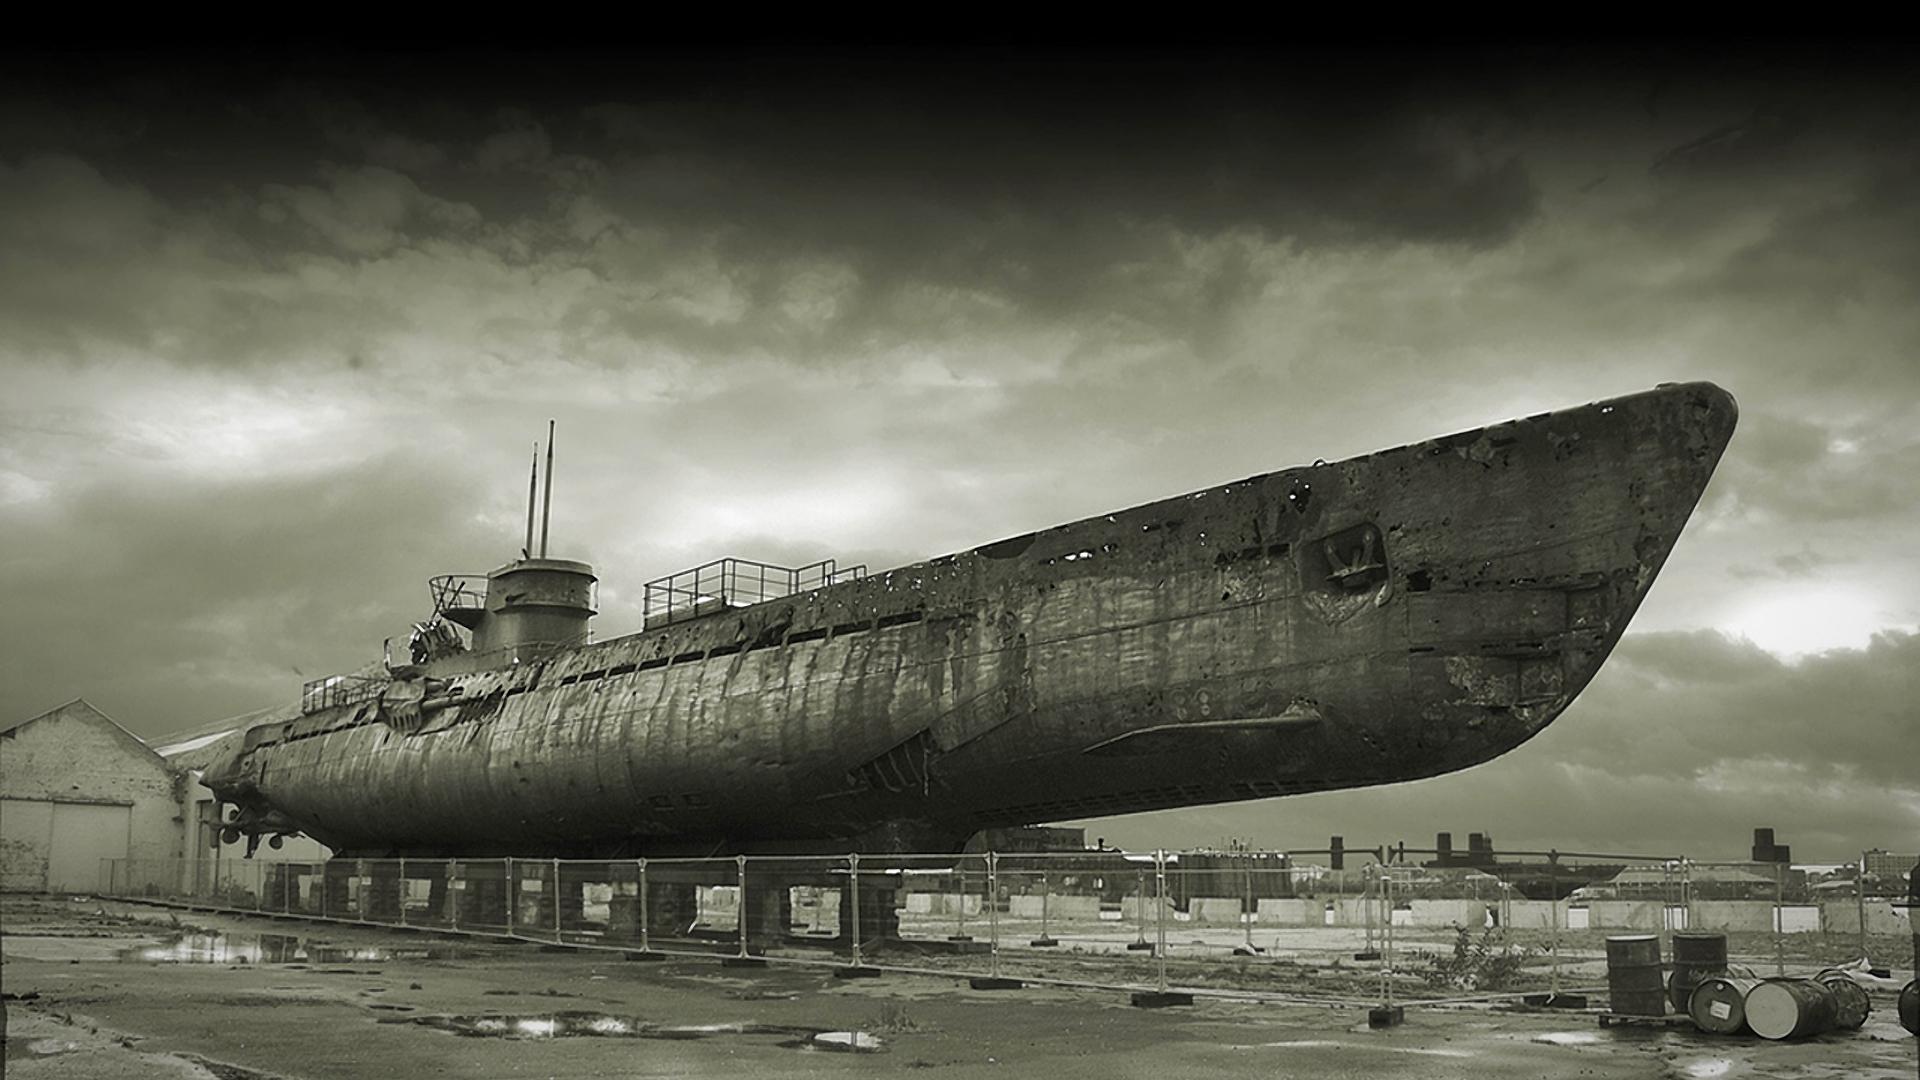 Military-Submarine-Ships-Navy-Boats-Battles-Vehicles-U-boat-Fresh-HD-wallpaper-wp3808222